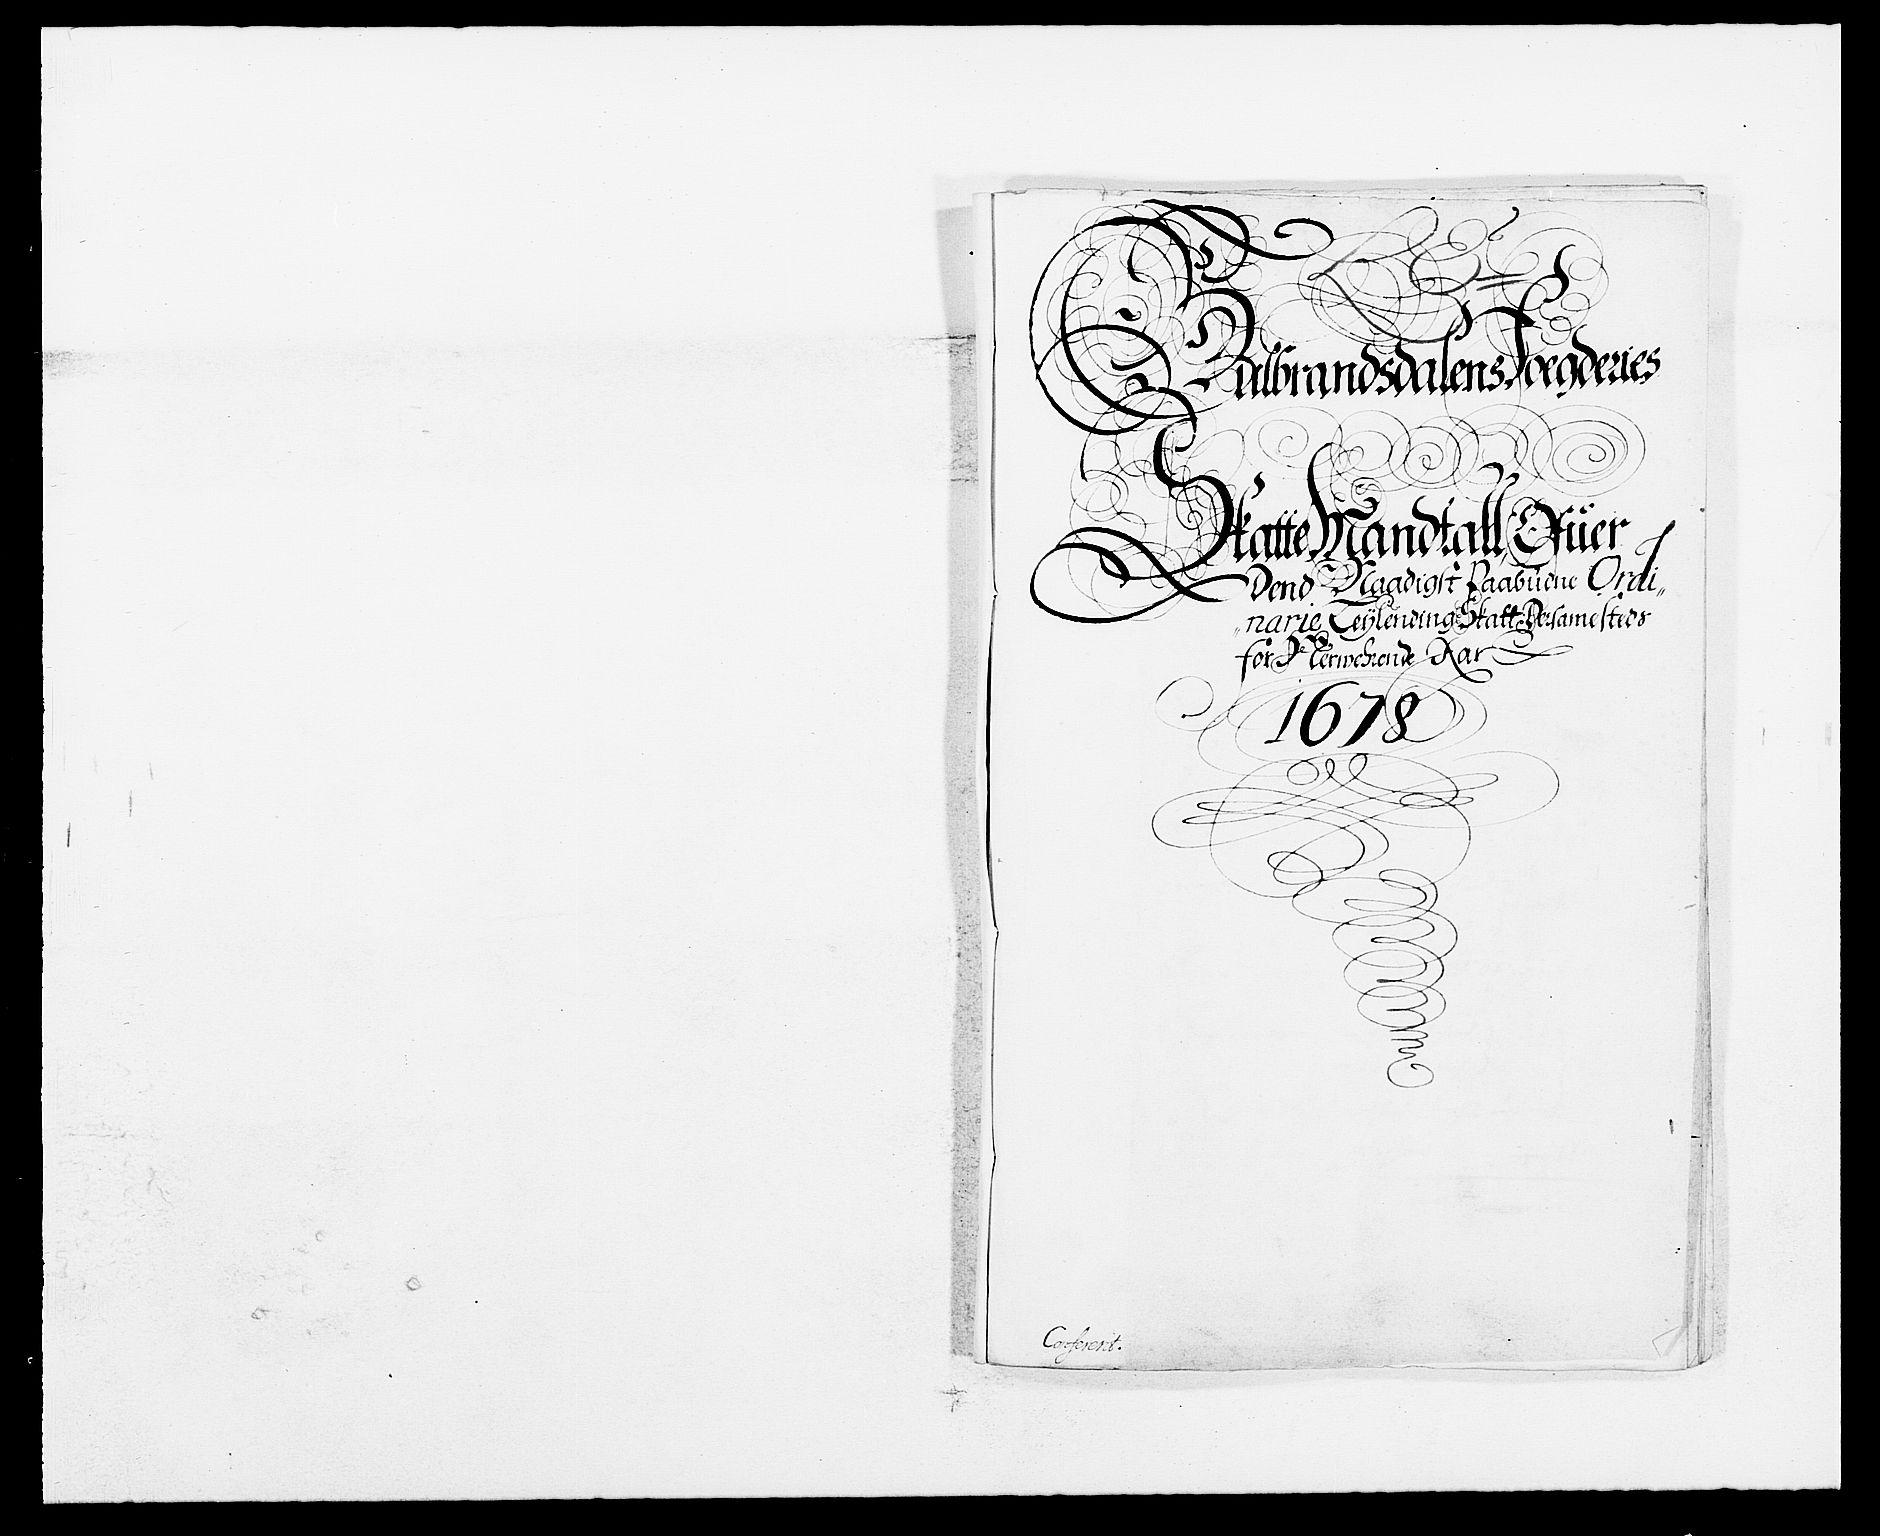 RA, Rentekammeret inntil 1814, Reviderte regnskaper, Fogderegnskap, R17/L1152: Fogderegnskap Gudbrandsdal, 1678-1679, s. 217